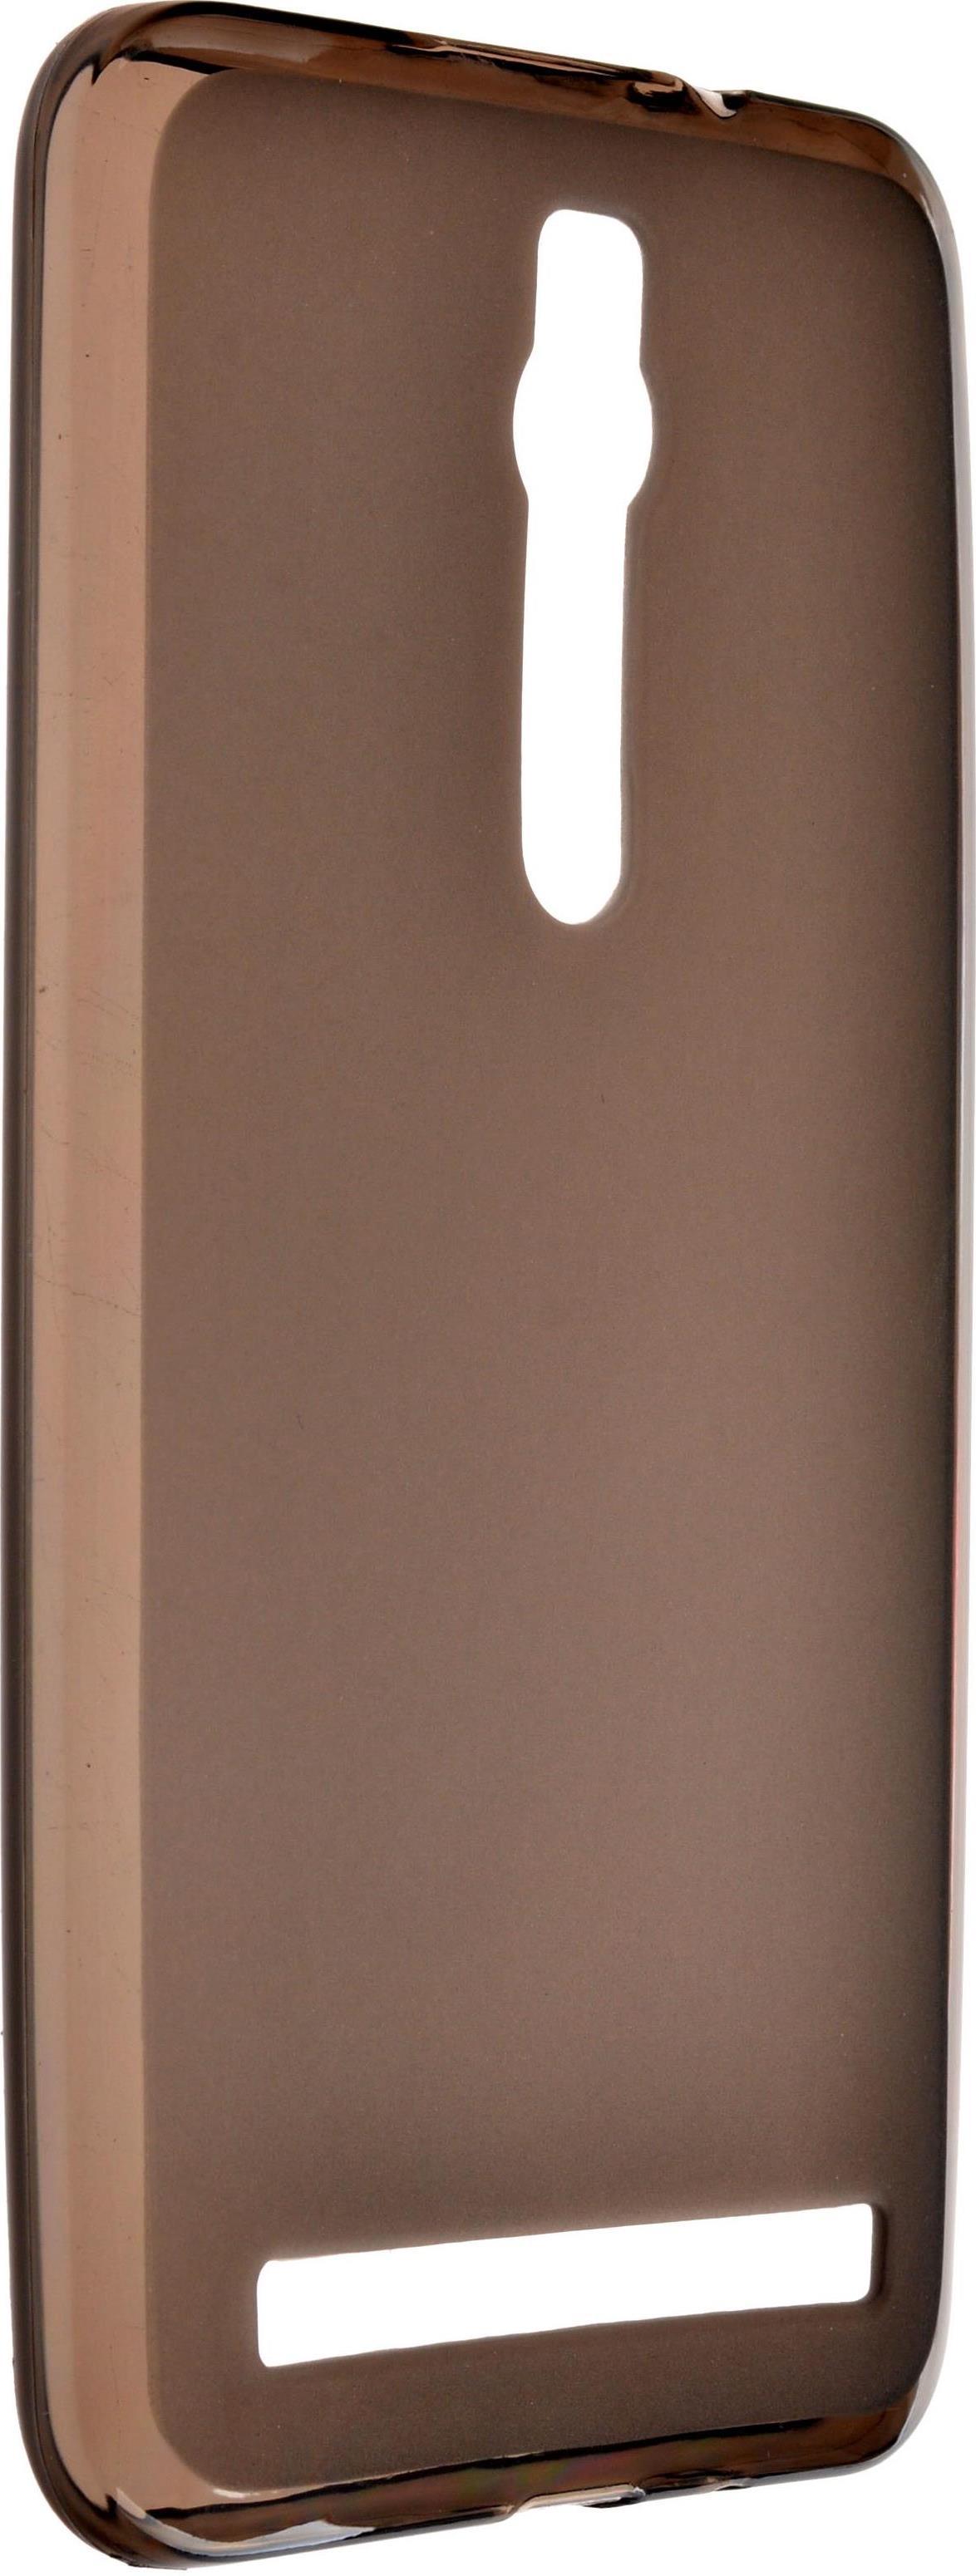 Чехол skinBOX 4People Shield silicone для Asus ZenFone 2 ZE550MLZE551ML коричневый